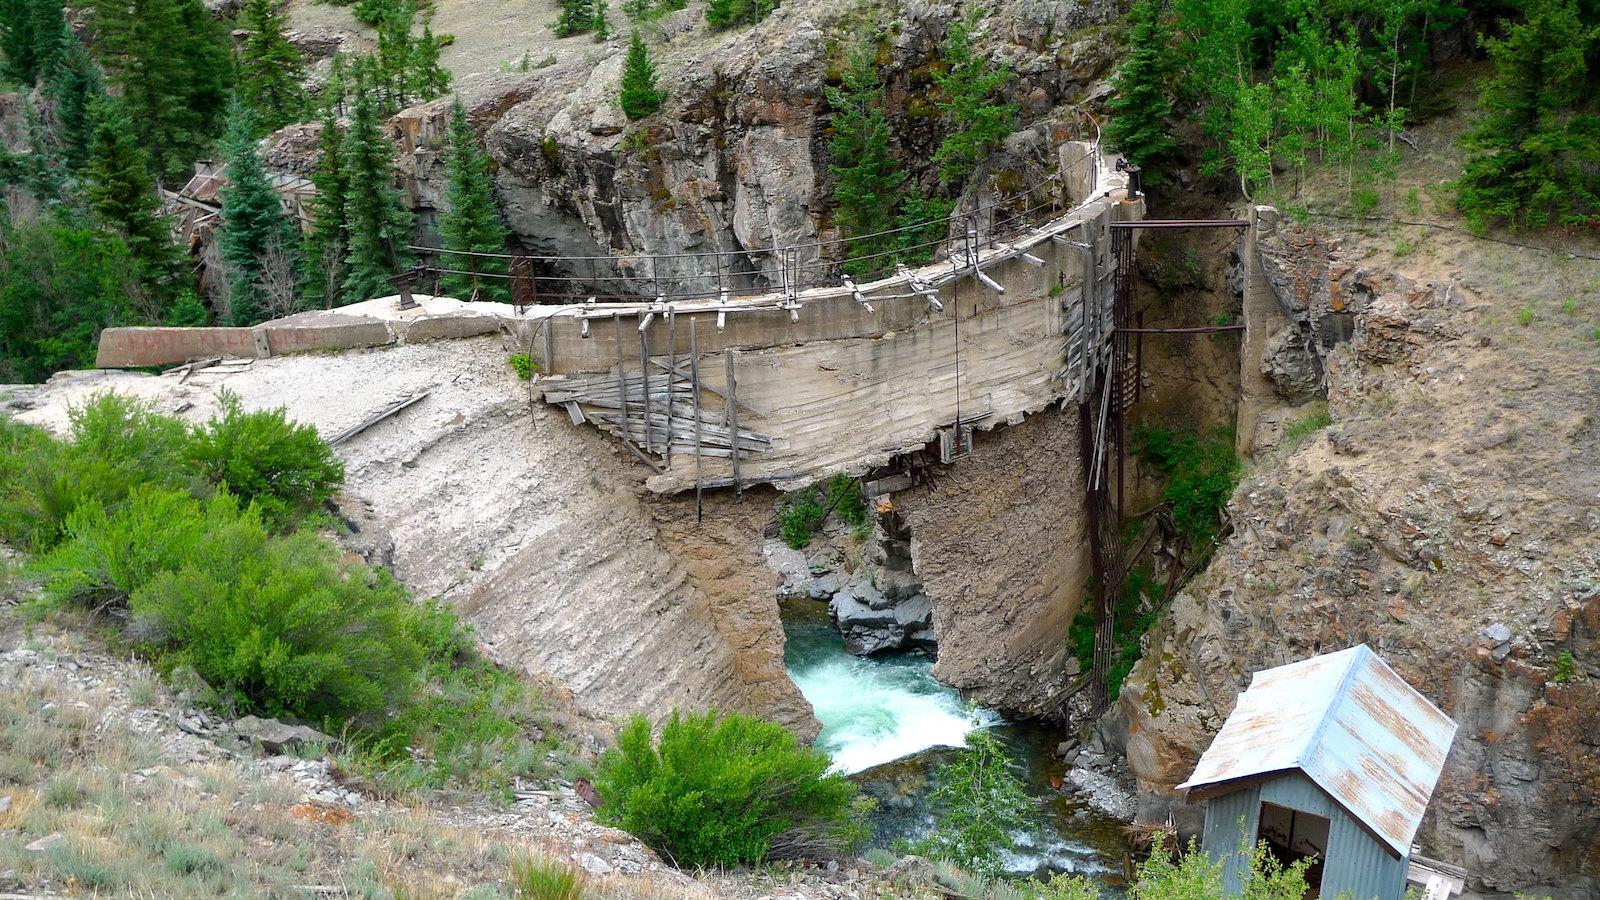 Image of the Henson Creek Dam in Colorado